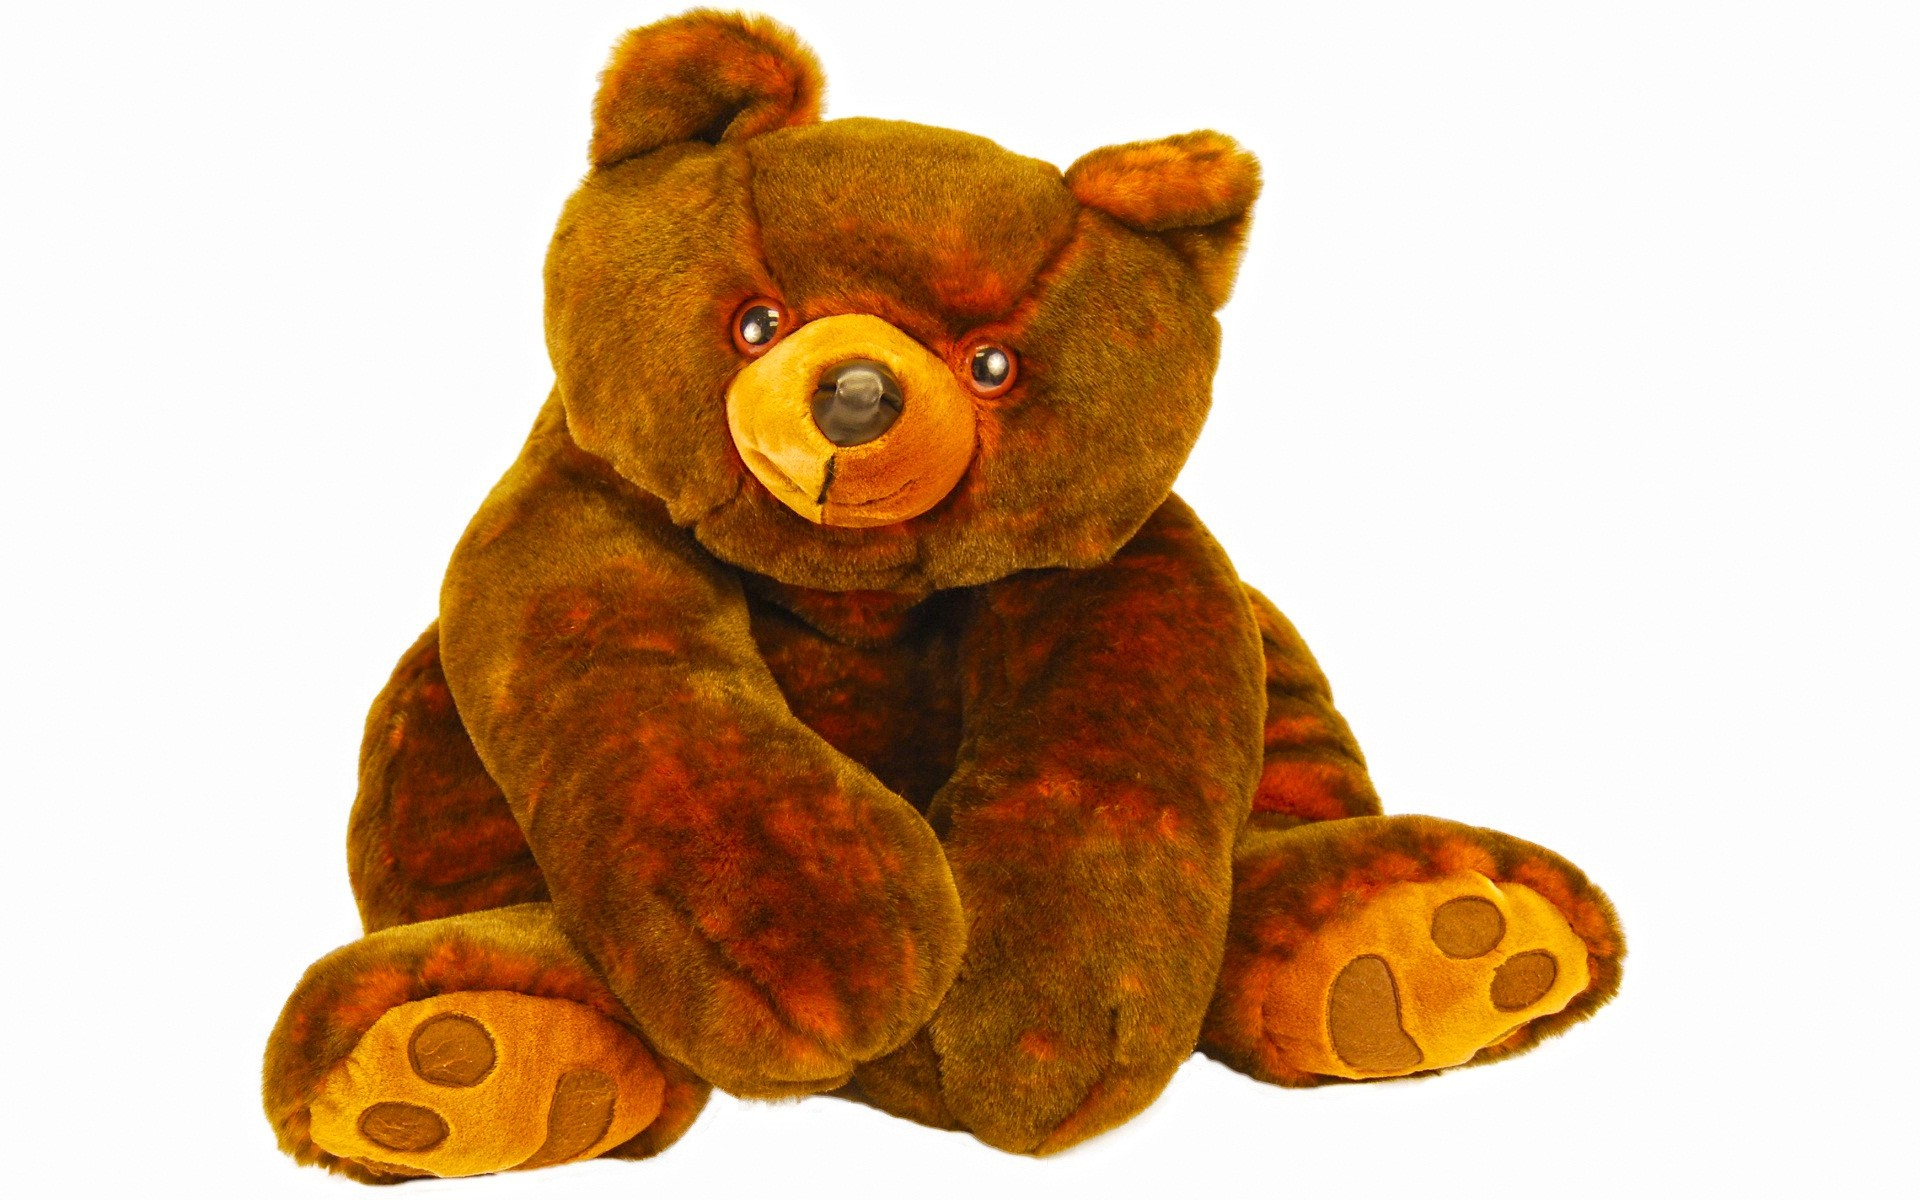 Res: 1920x1200, Funny teddy bear wallpaper